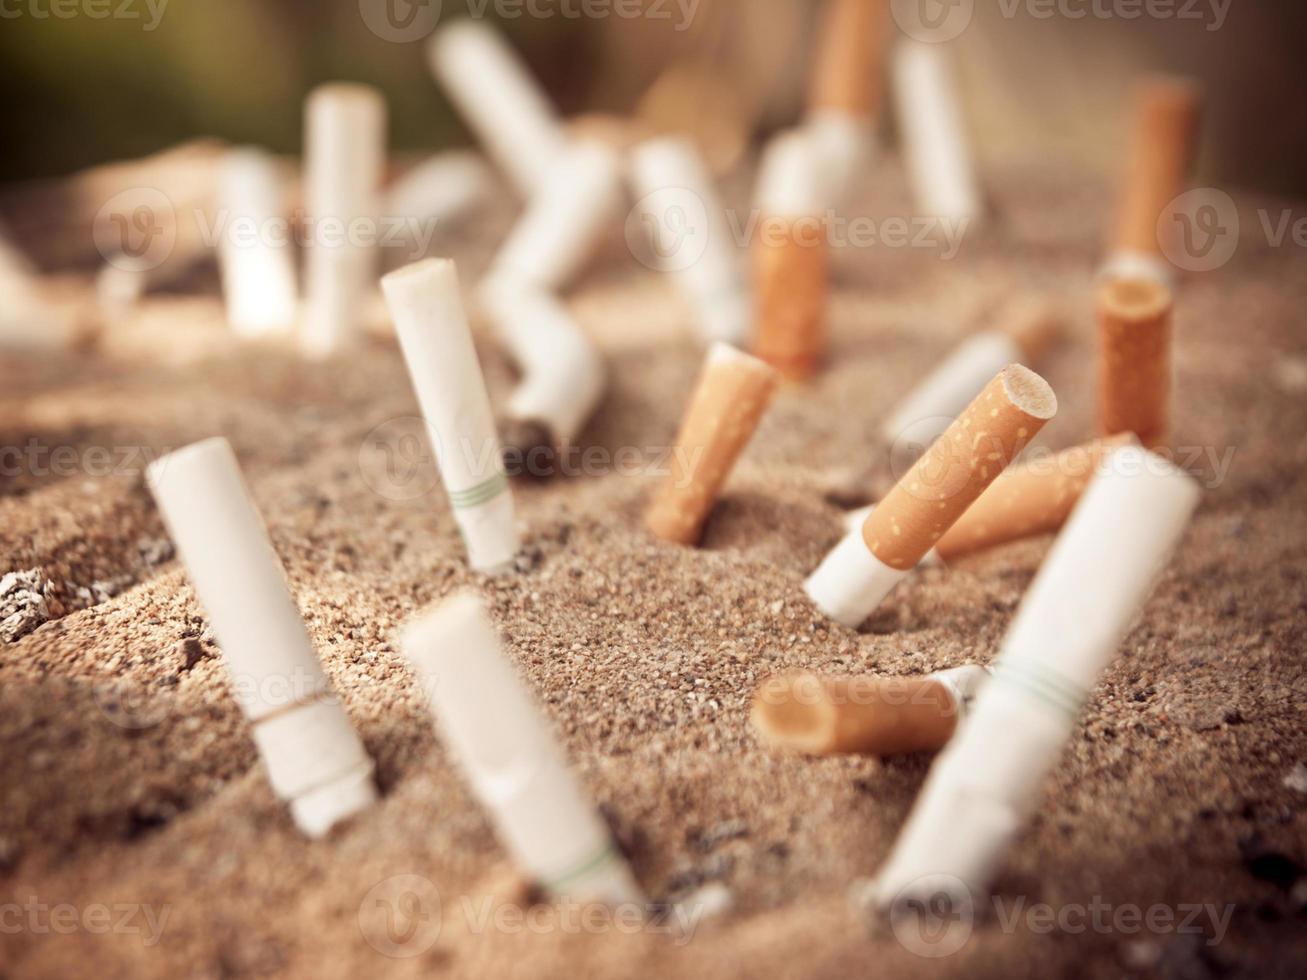 veel verbrande sigaretten op asbak en zand foto